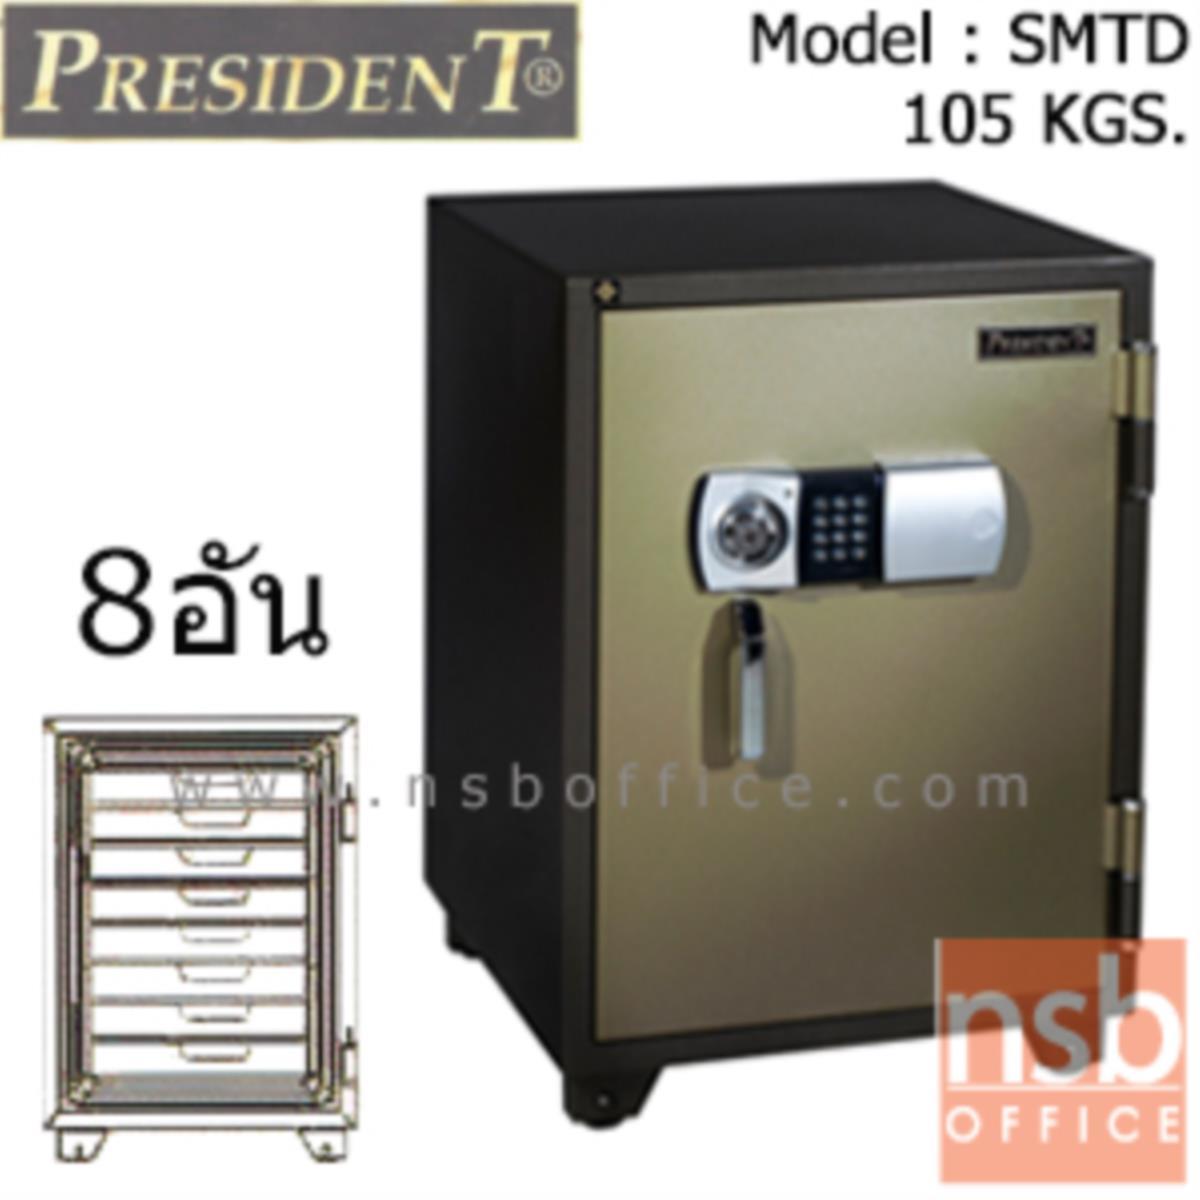 F05A052: ตู้เซฟดิจิตอล 105 กก. มีถาด 8 อัน  รุ่น PRESIDENT-SMTD  มี 1 กุญแจ 1 รหัส (รหัสใช้กดหน้าตู้)